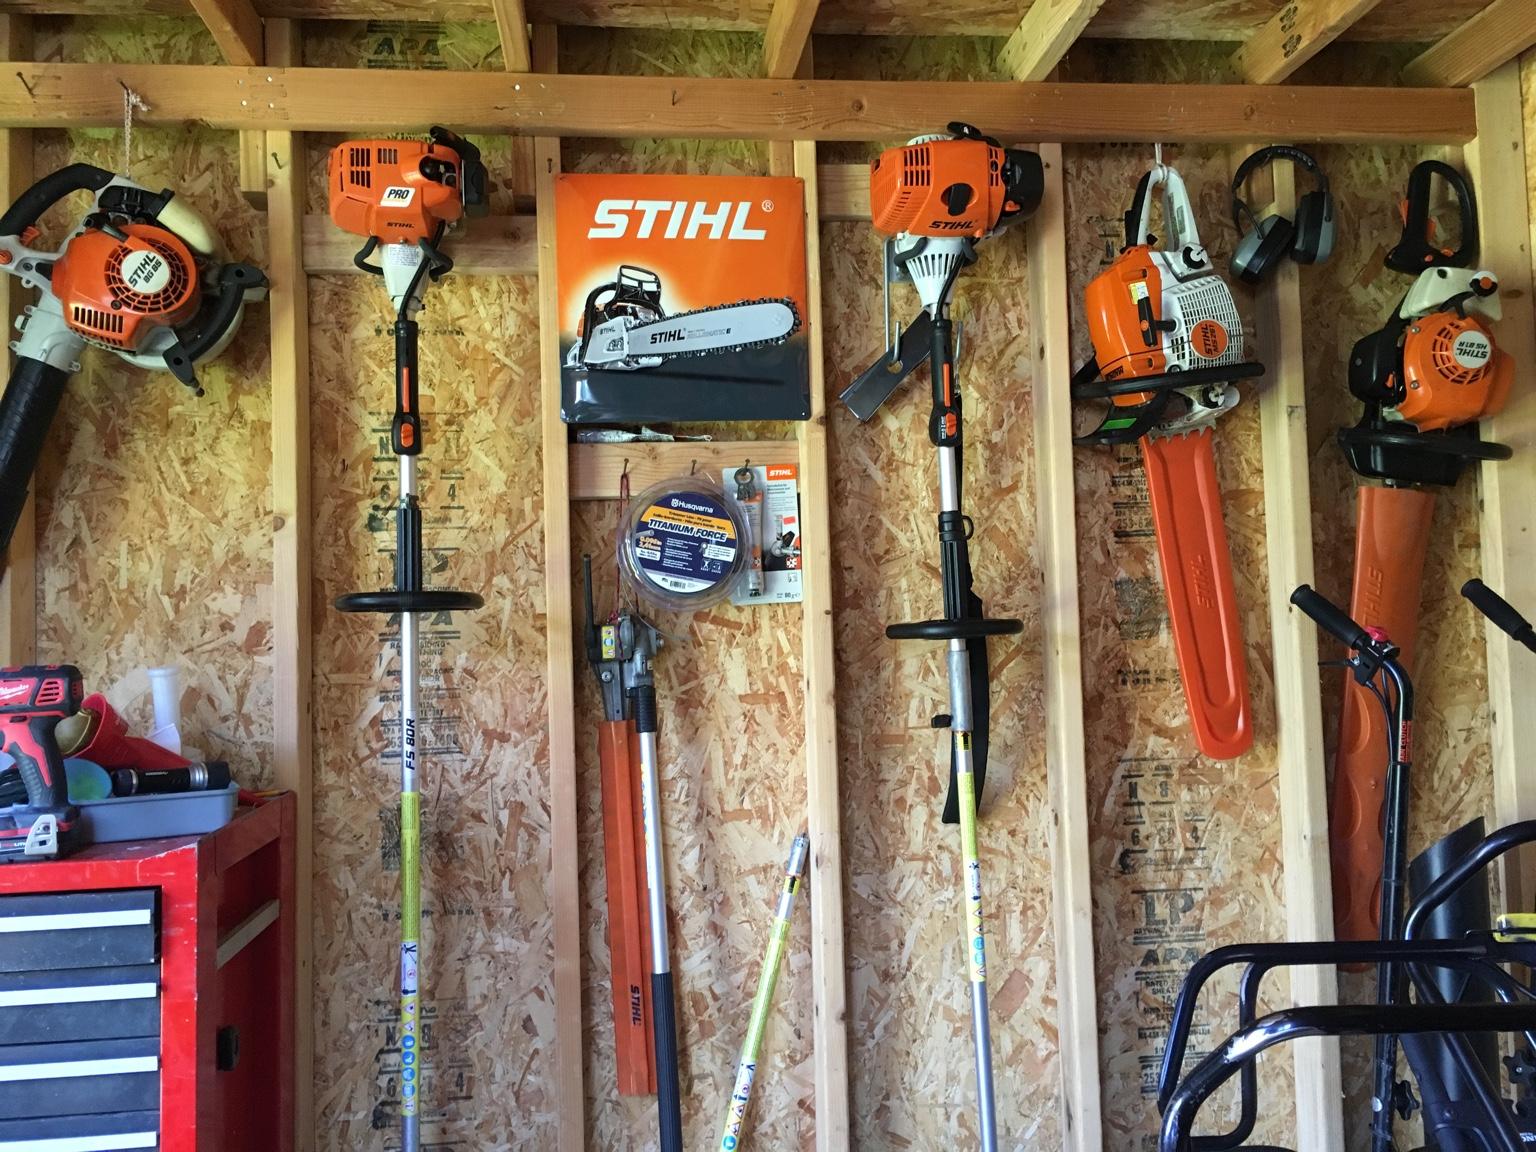 Stihl wall of fame!   Arboristsite.com